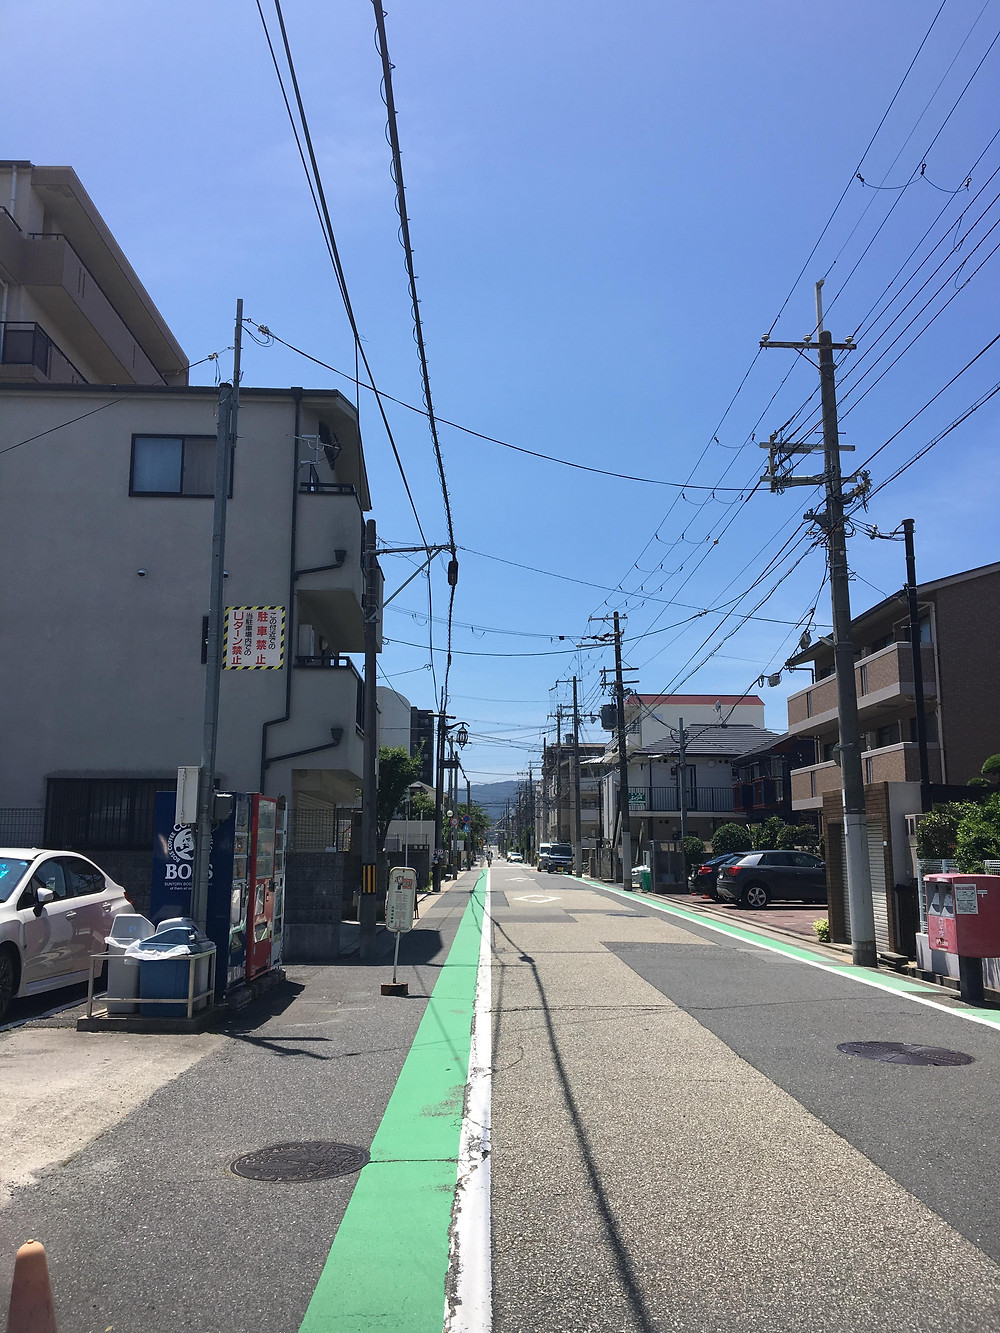 My street in Nishinomiya